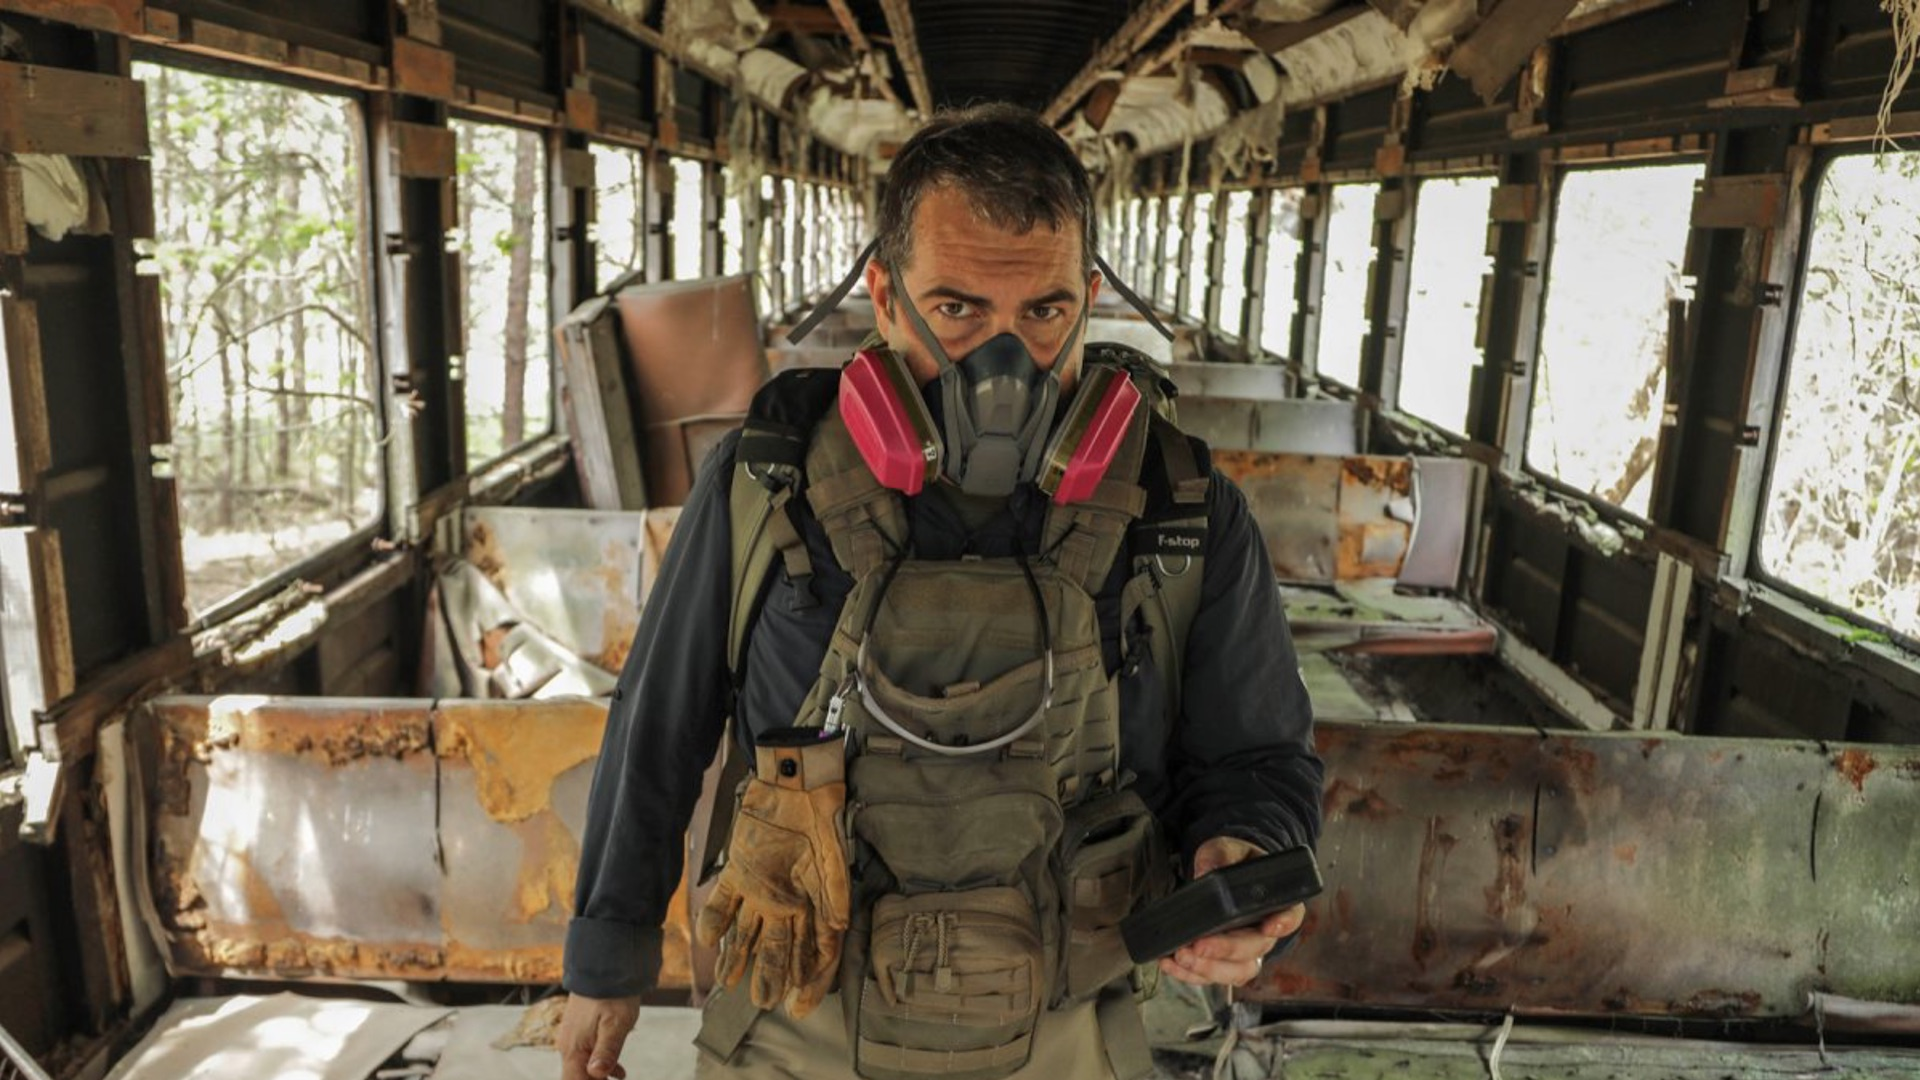 philip-grossman-chernobyl-premiere-pro.jpg